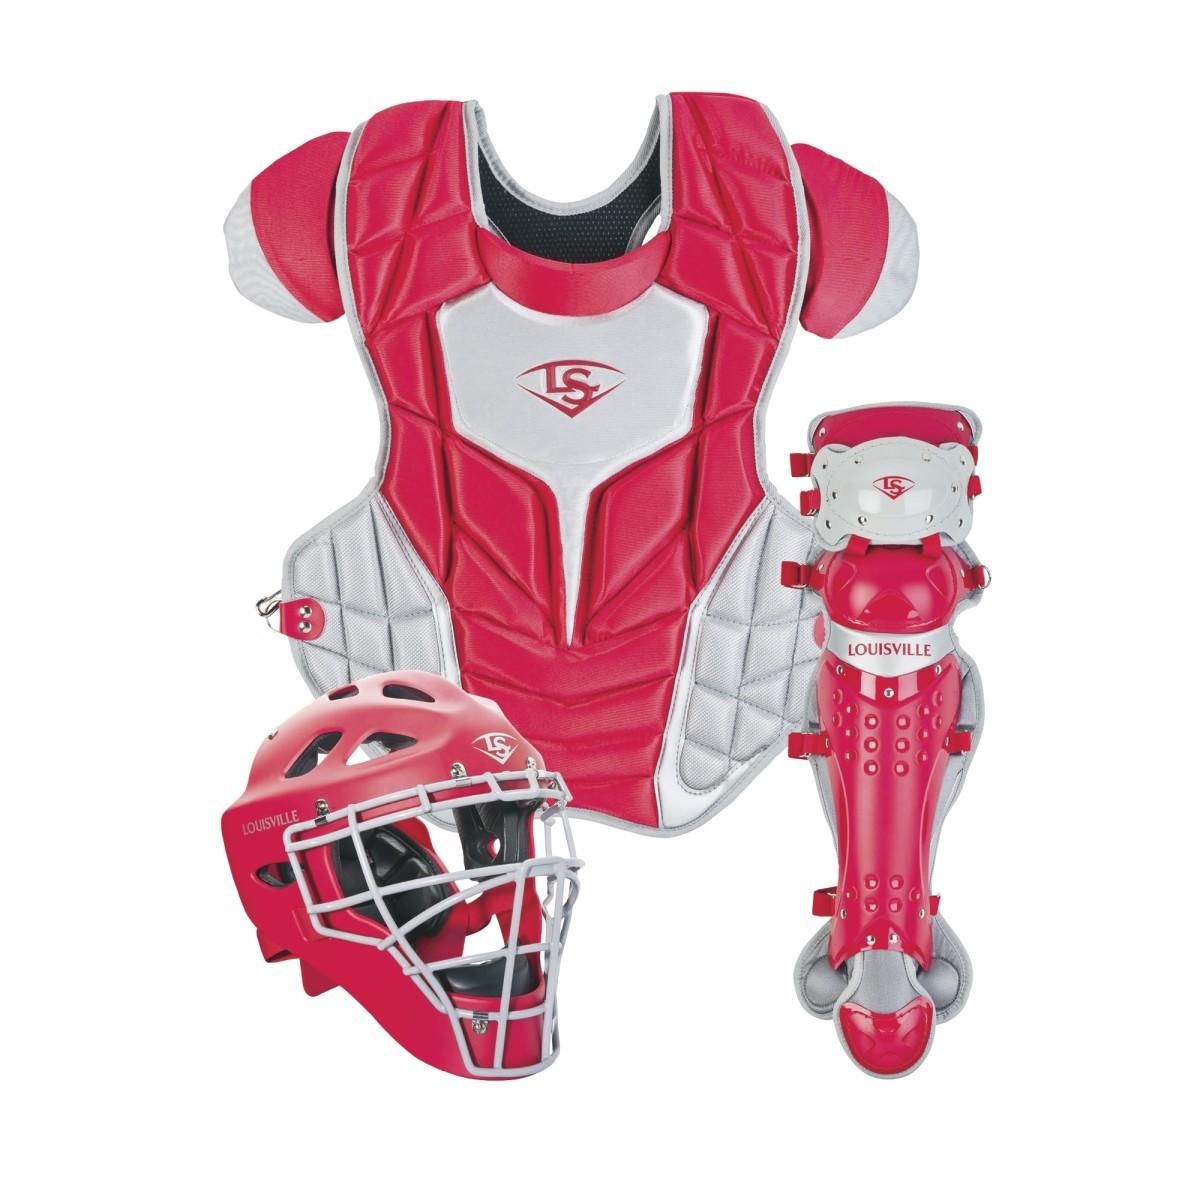 adult football equipment jpg 422x640